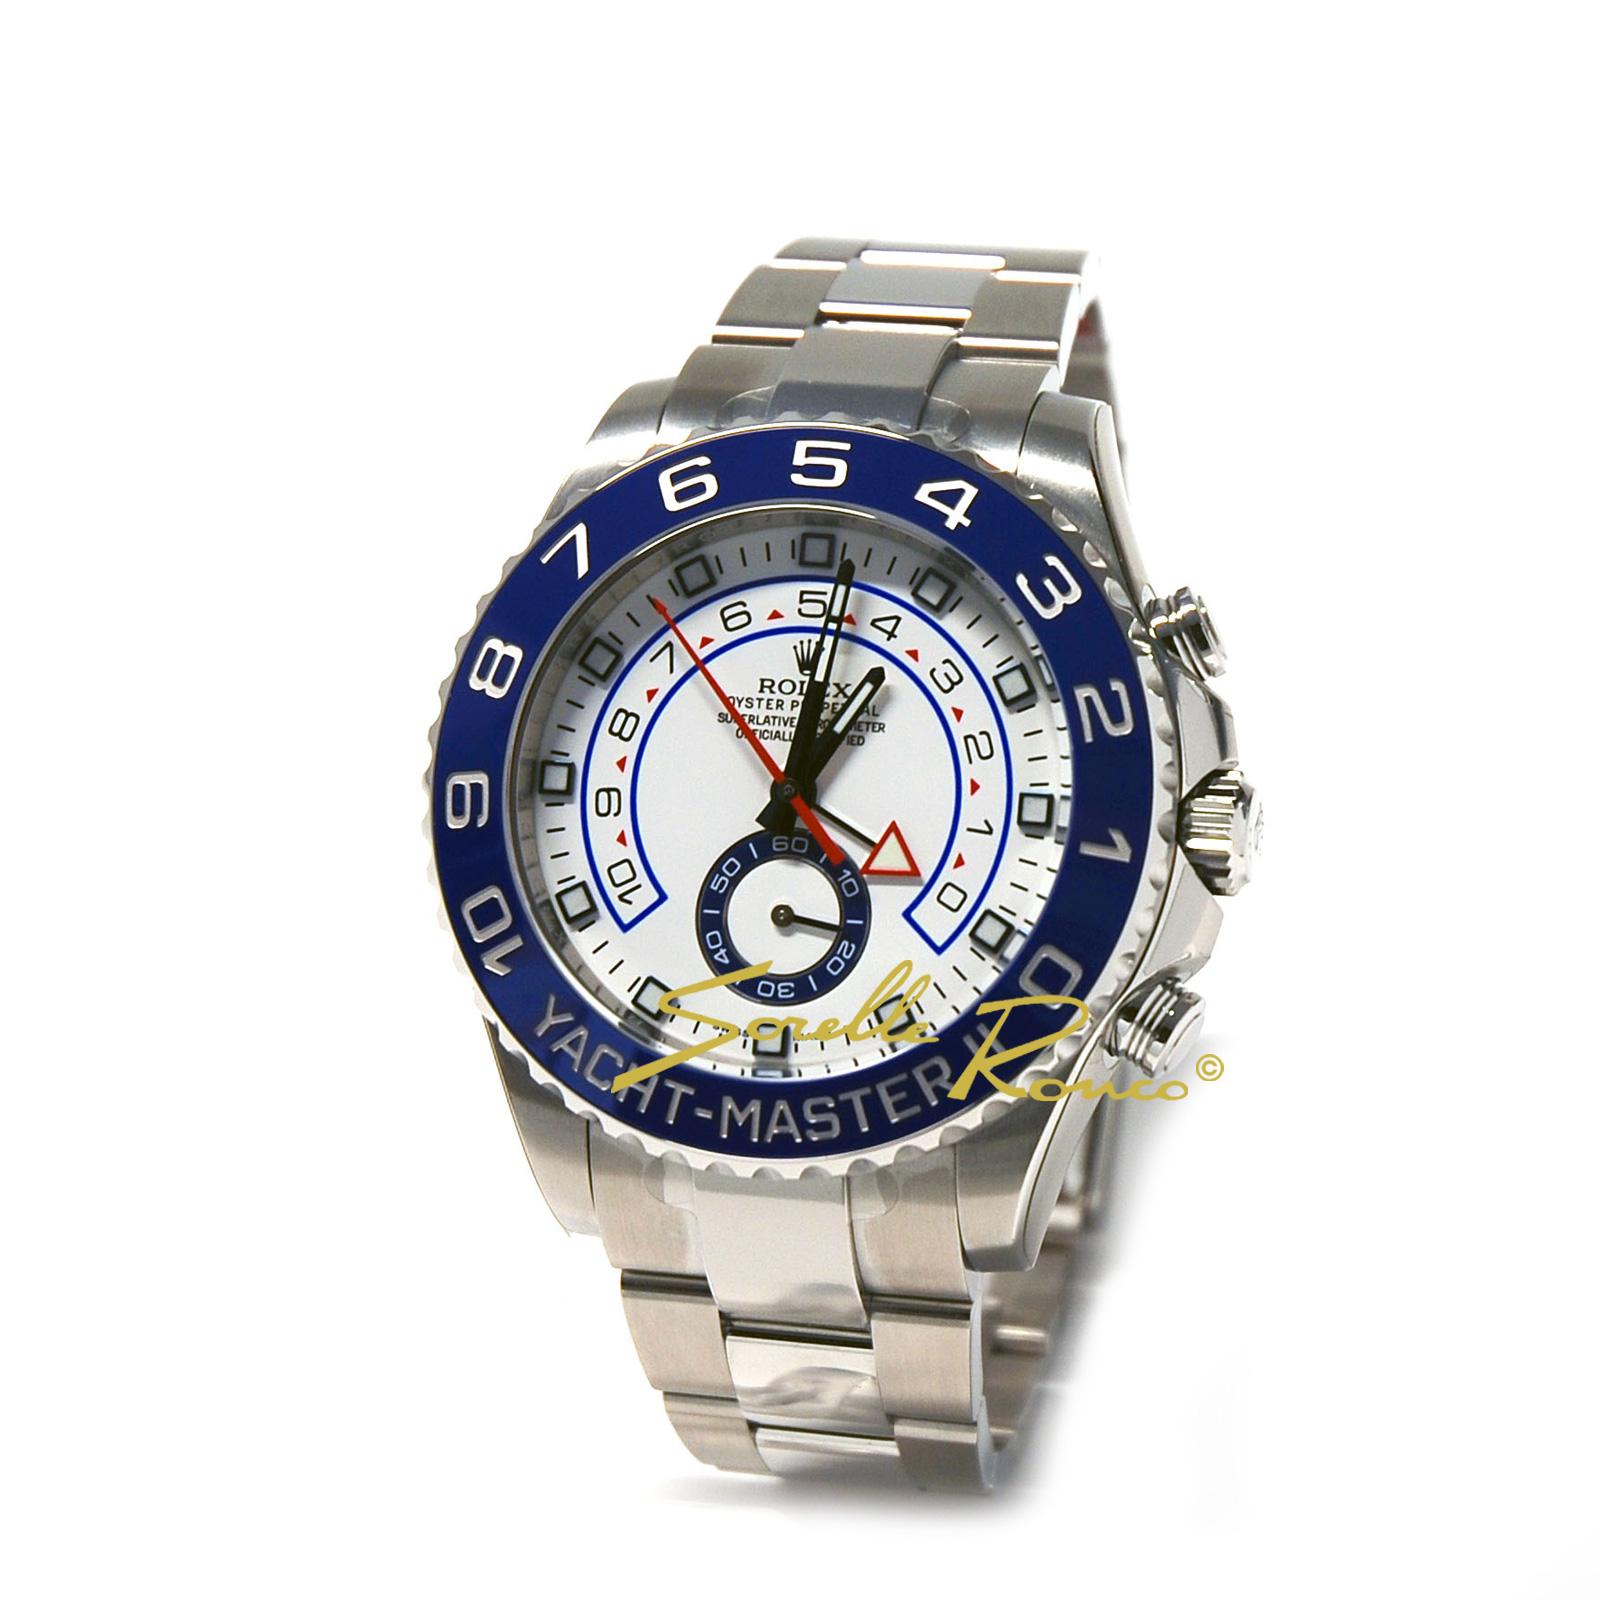 https://www.sorelleronco.it/Occasioni/schede_orologi/Rolex/wcr2282-ROLEX-Yacht-Master-2-Acciaio/ROLEX-Yacht-Master-116680.jpg